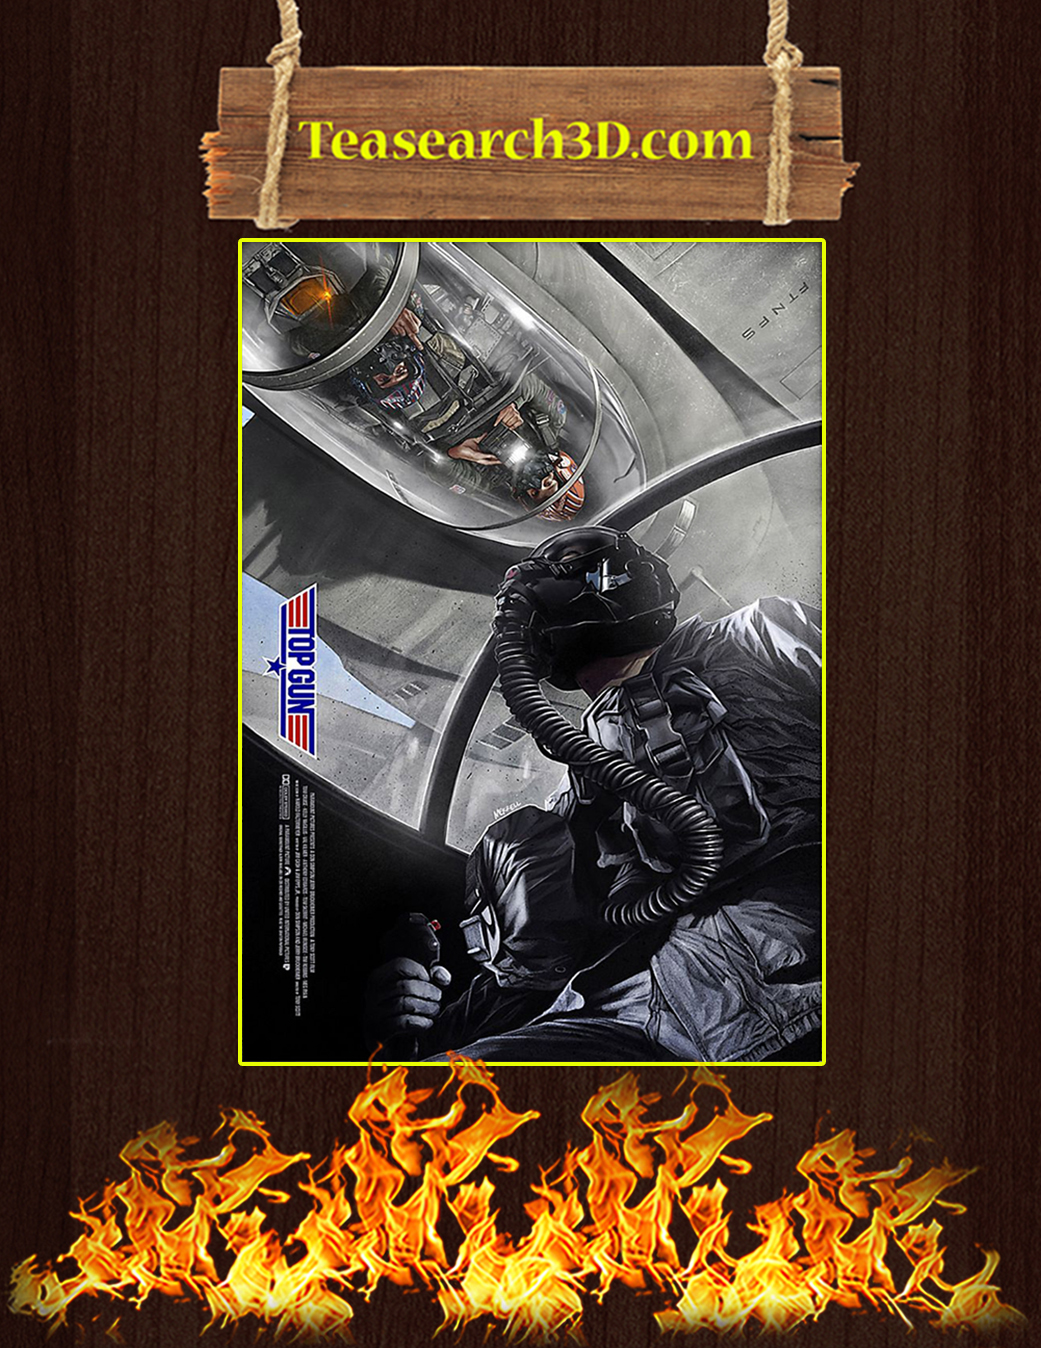 Top gun flyby poster A1